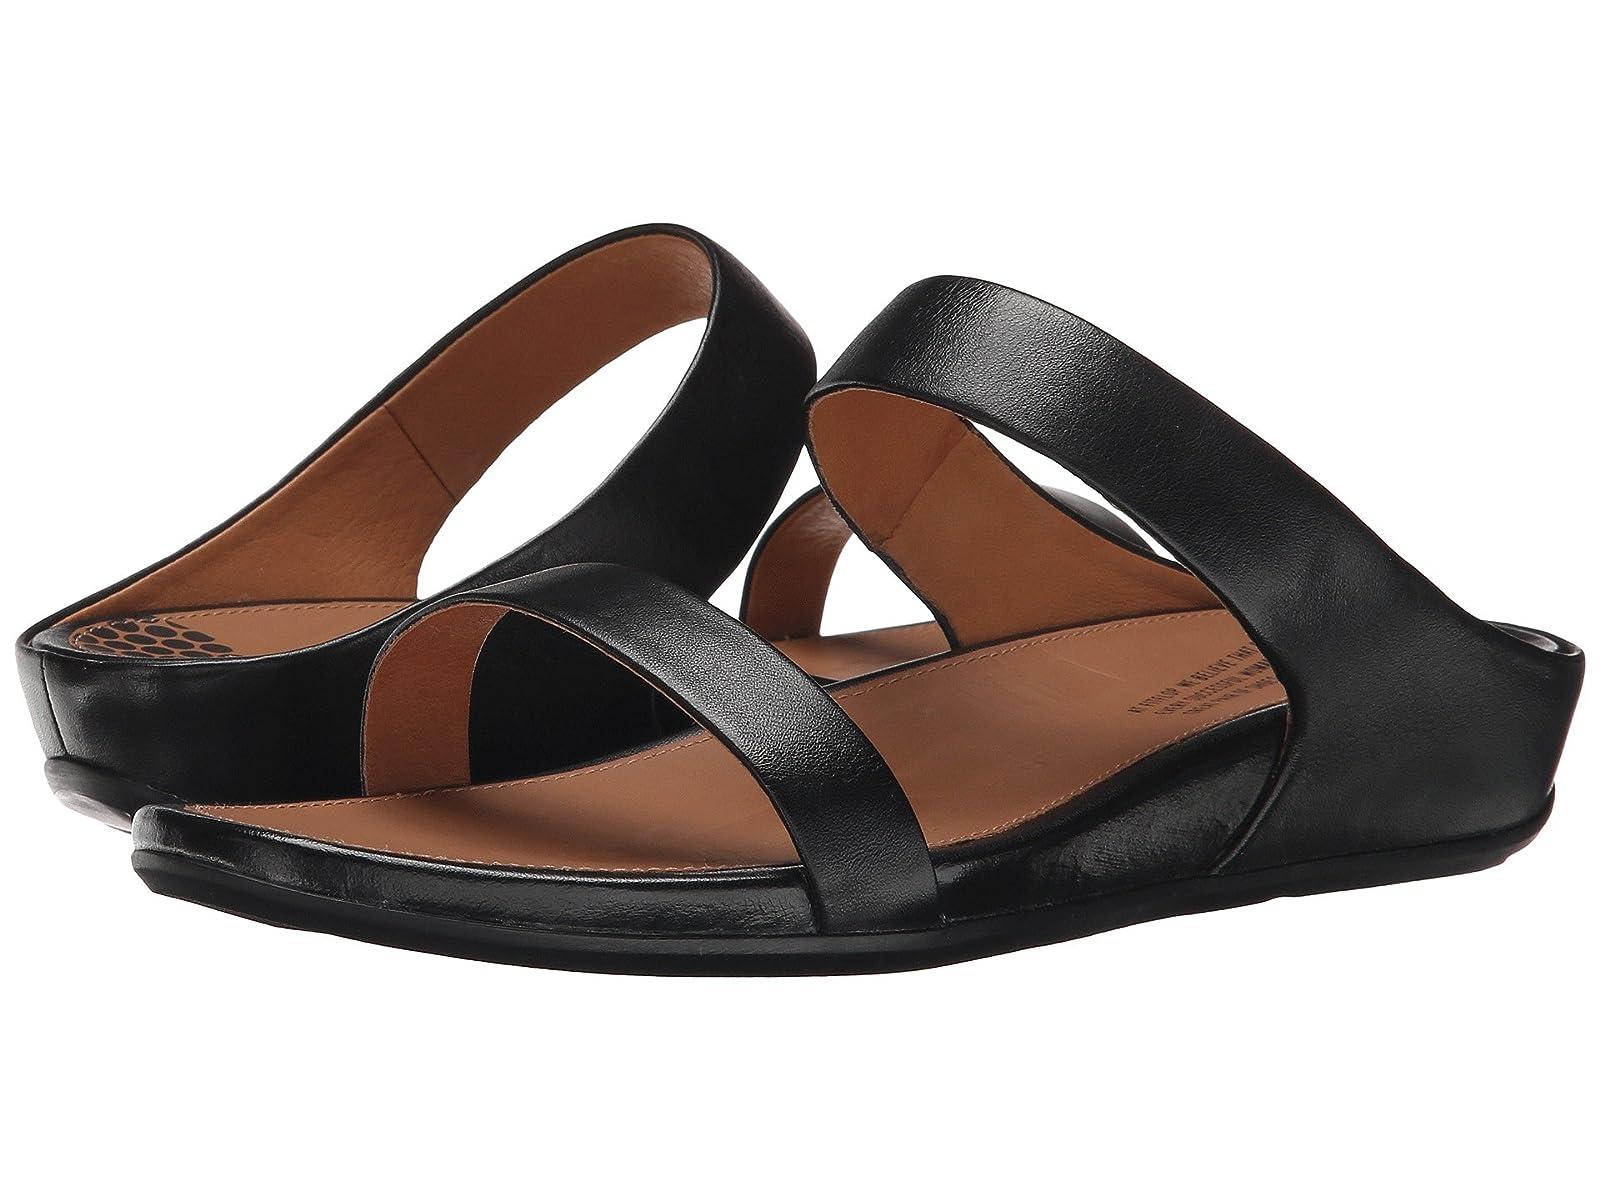 FitFlop Banda SlideCheap and distinctive eye-catching shoes